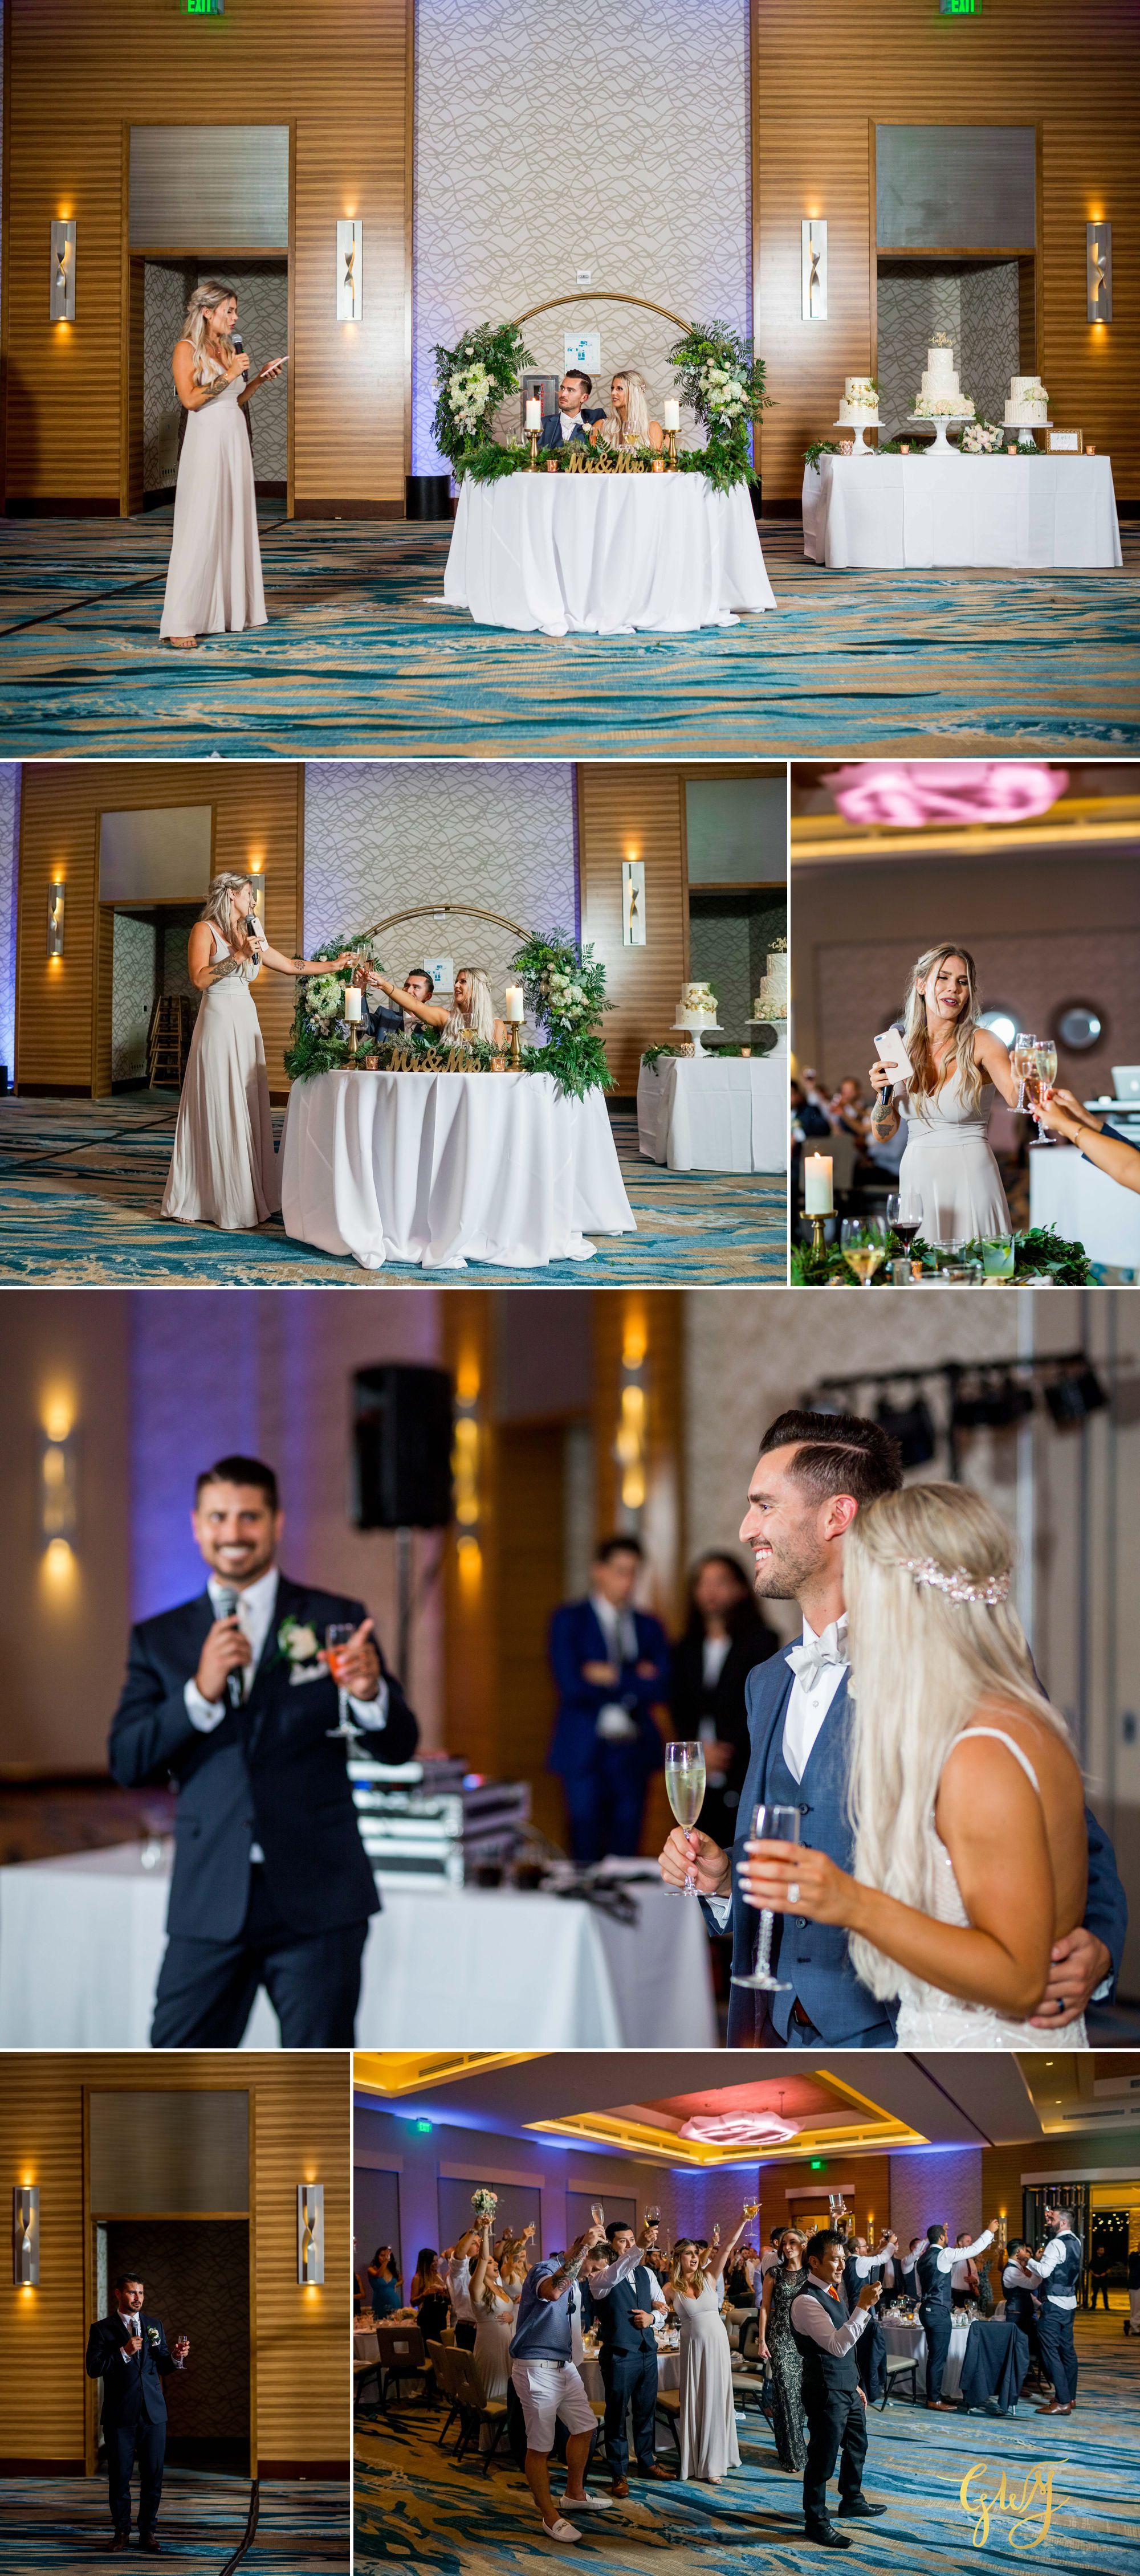 Christien + Crystal Pasea Hotel & Spa Huntington Beach Wedding by Glass Woods Meida 2 16.jpg